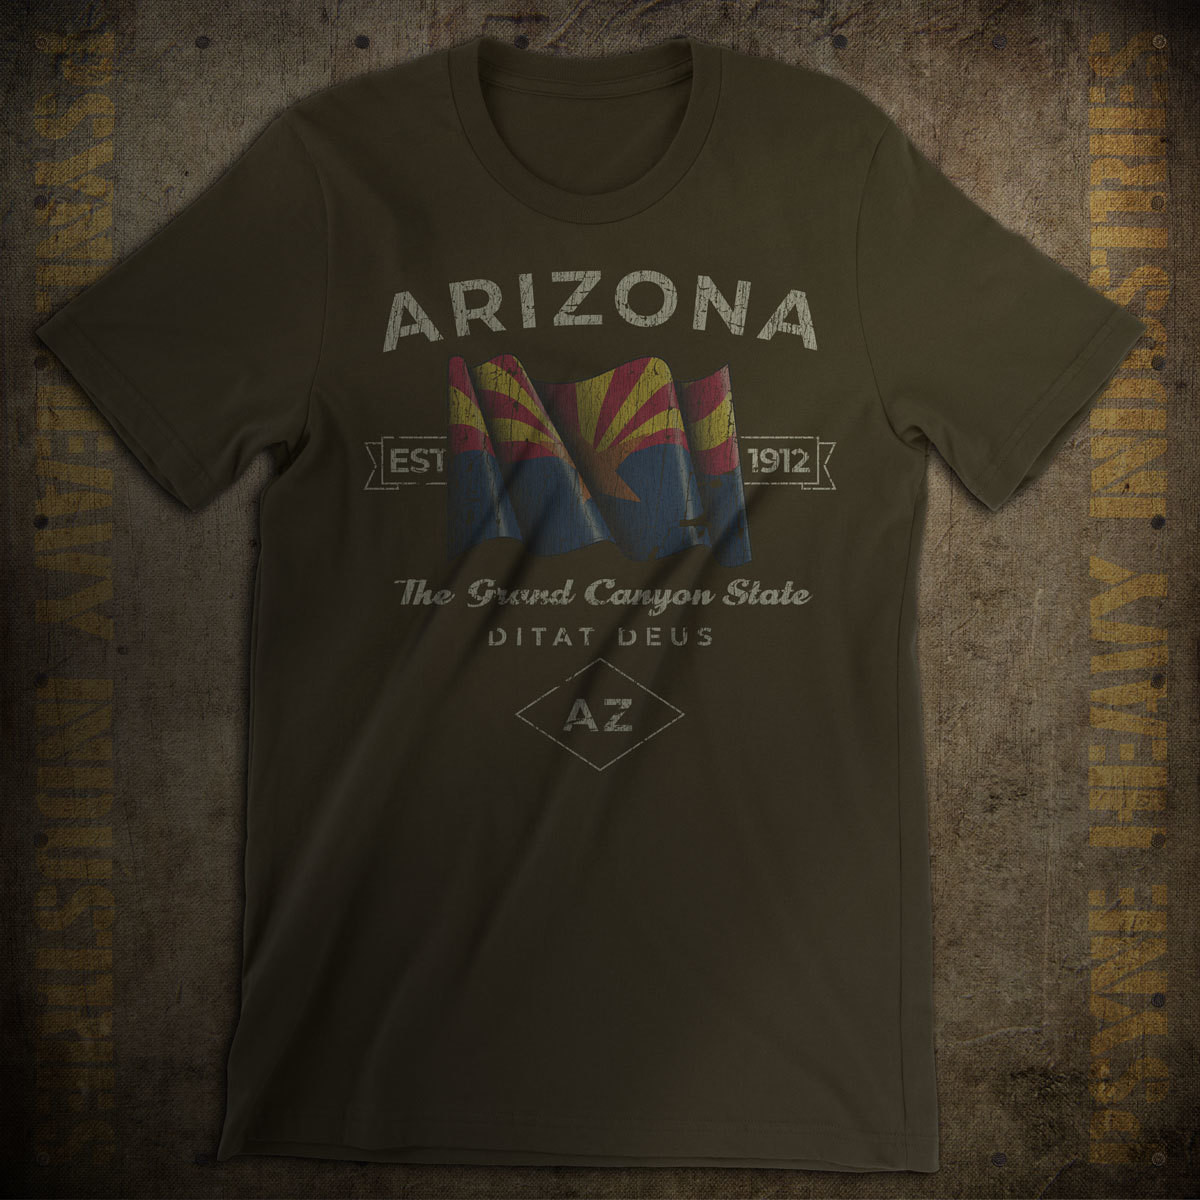 Arizona 1912 Vintage T-Shirt